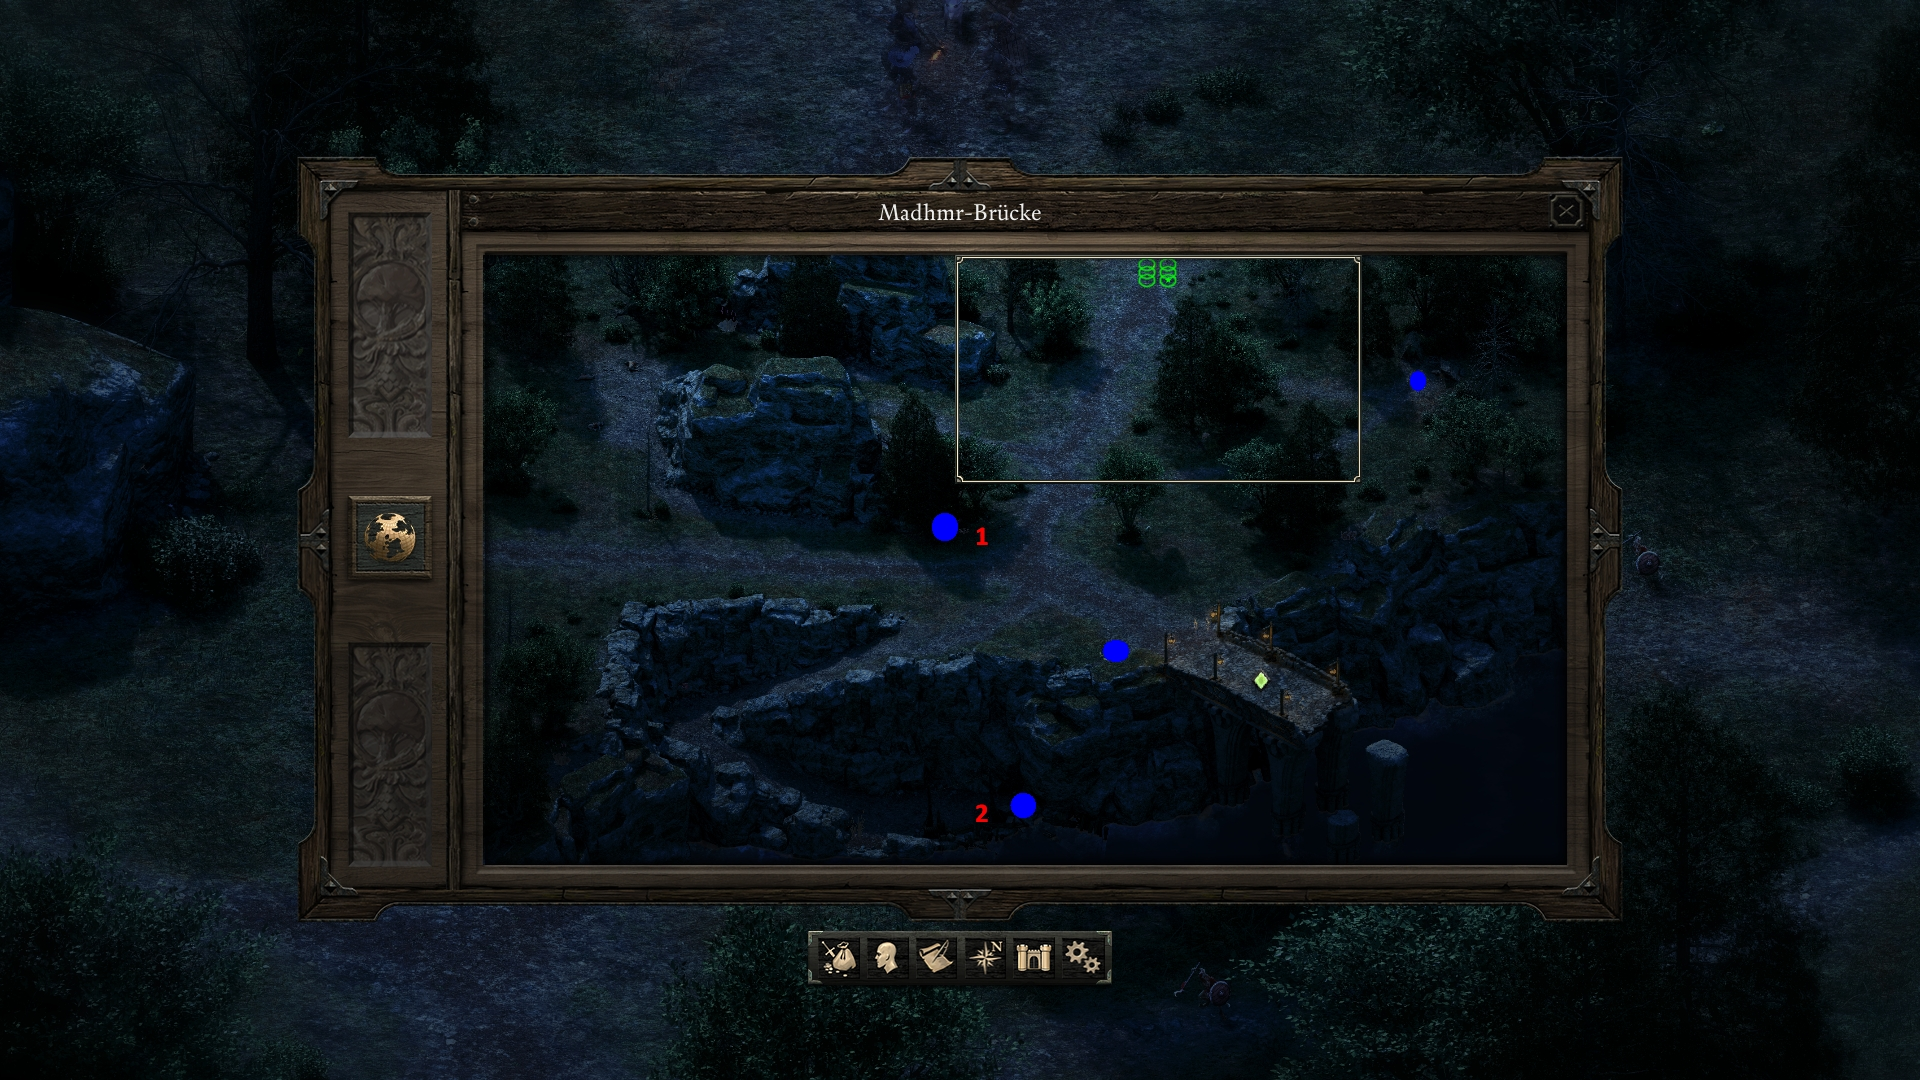 Pillars Of Eternity Karte.Pillars Of Eternity Guide Walkthrough Guide Gamersglobal De